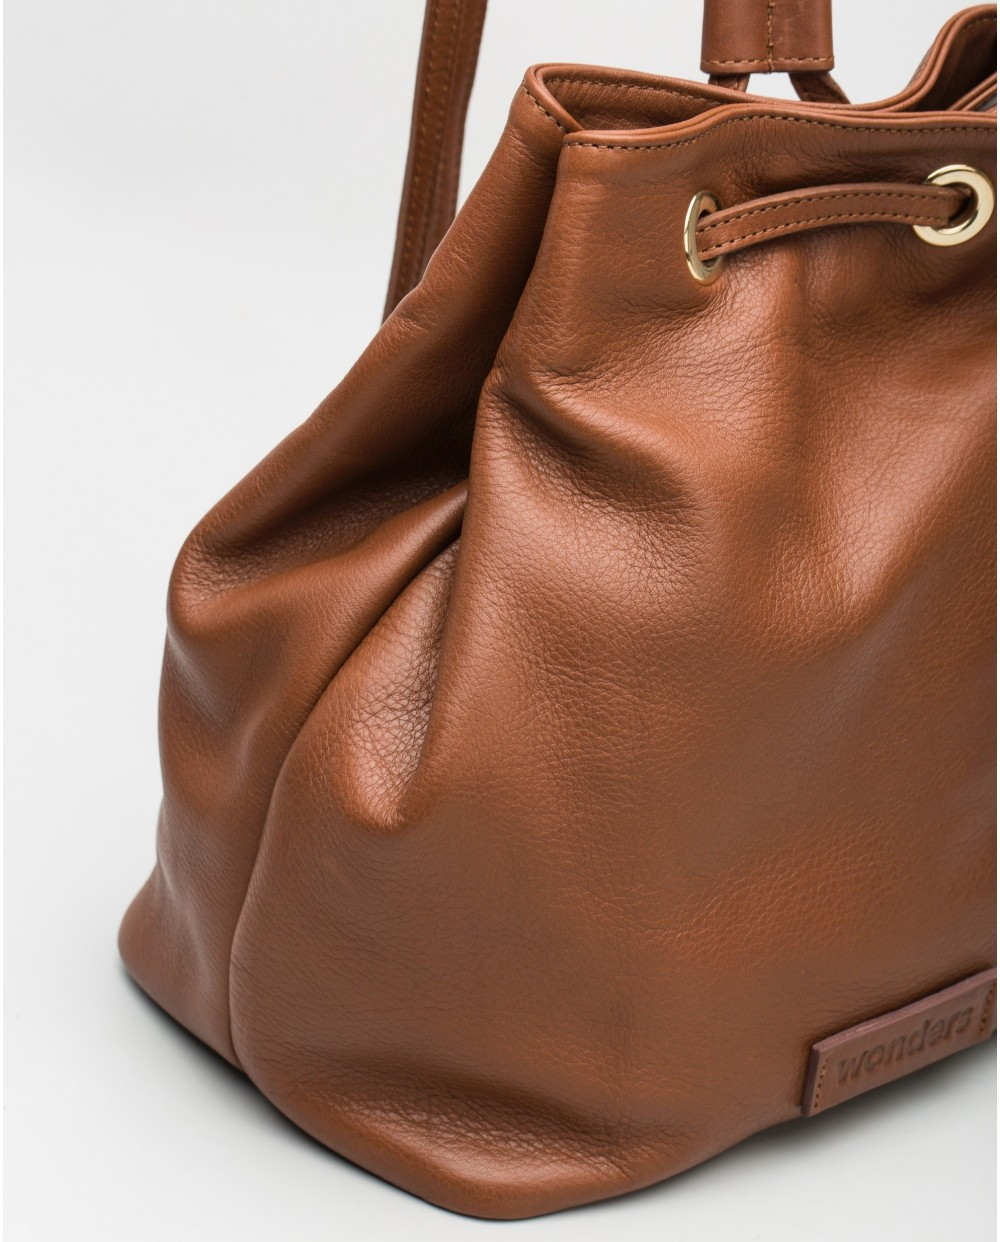 Wonders-Bags-Leather backpack